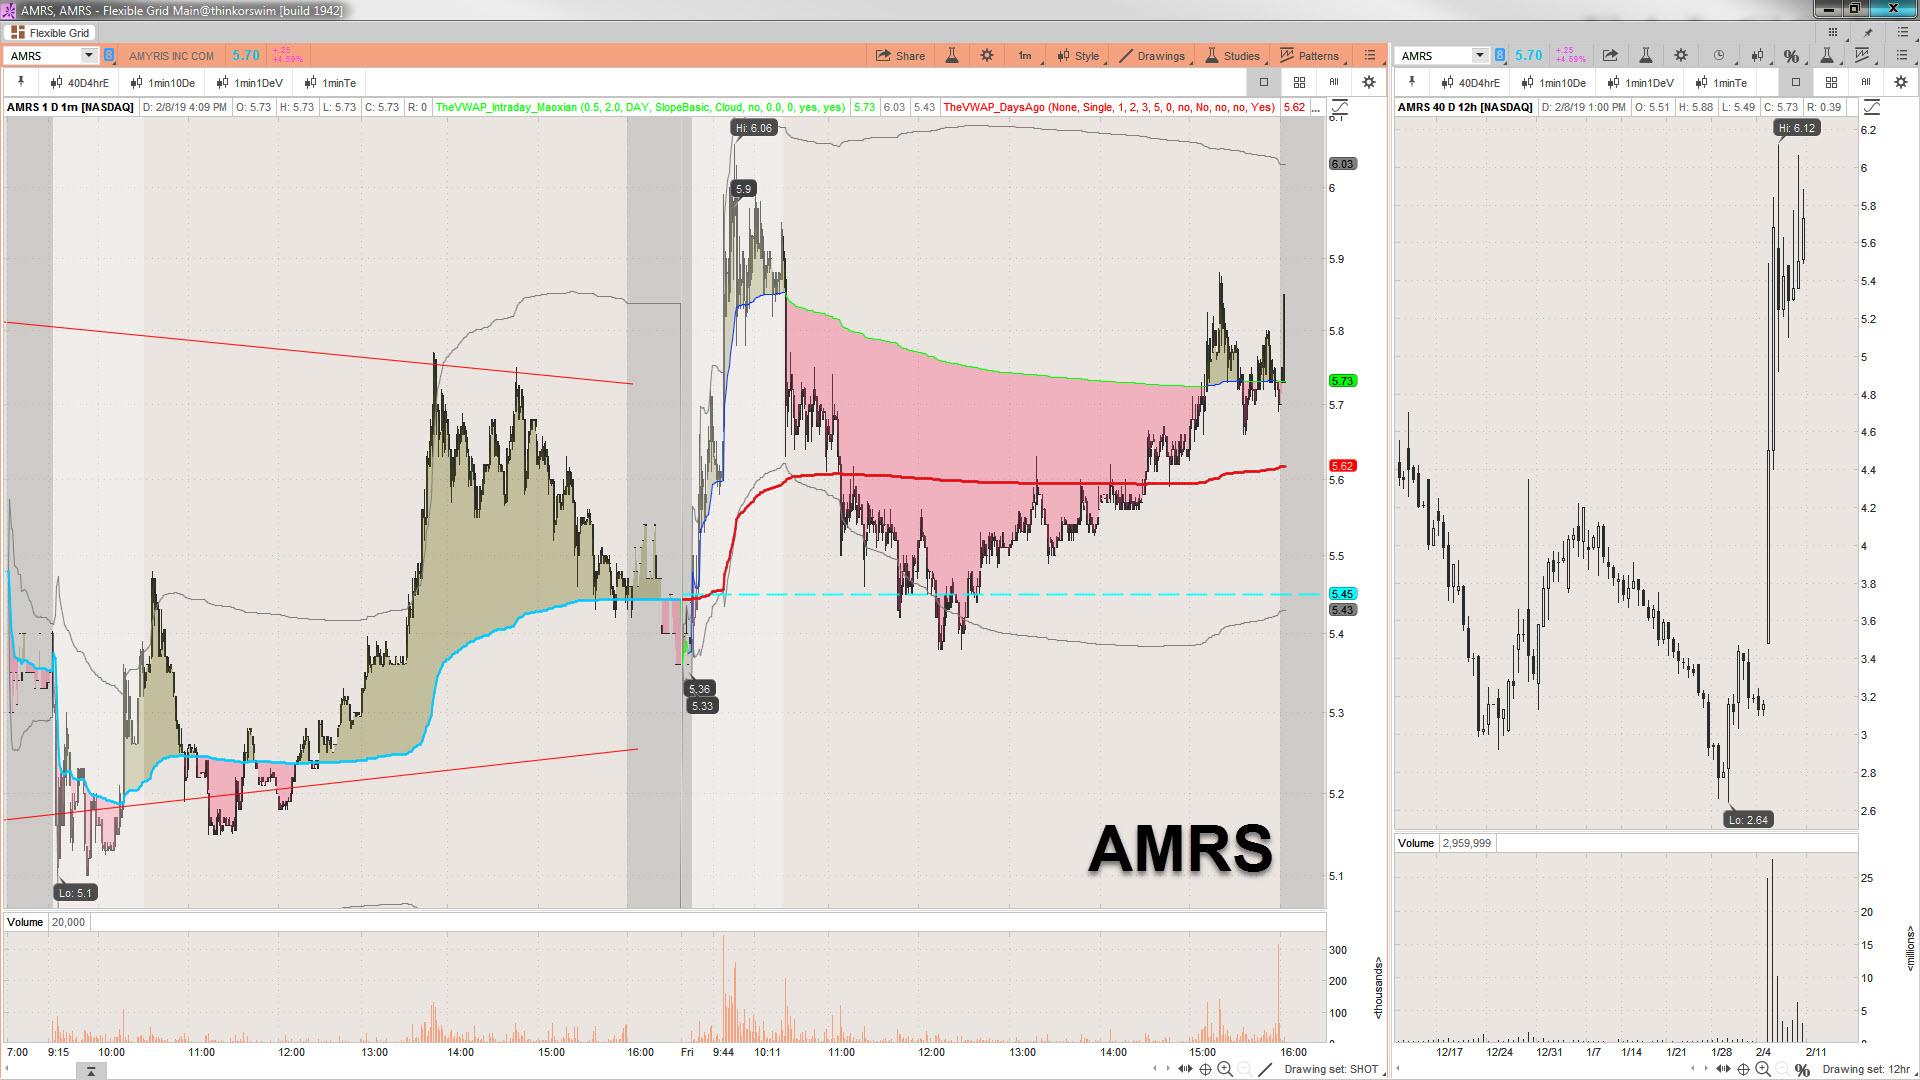 2019-02-08_16-10-51 AMRS.jpg